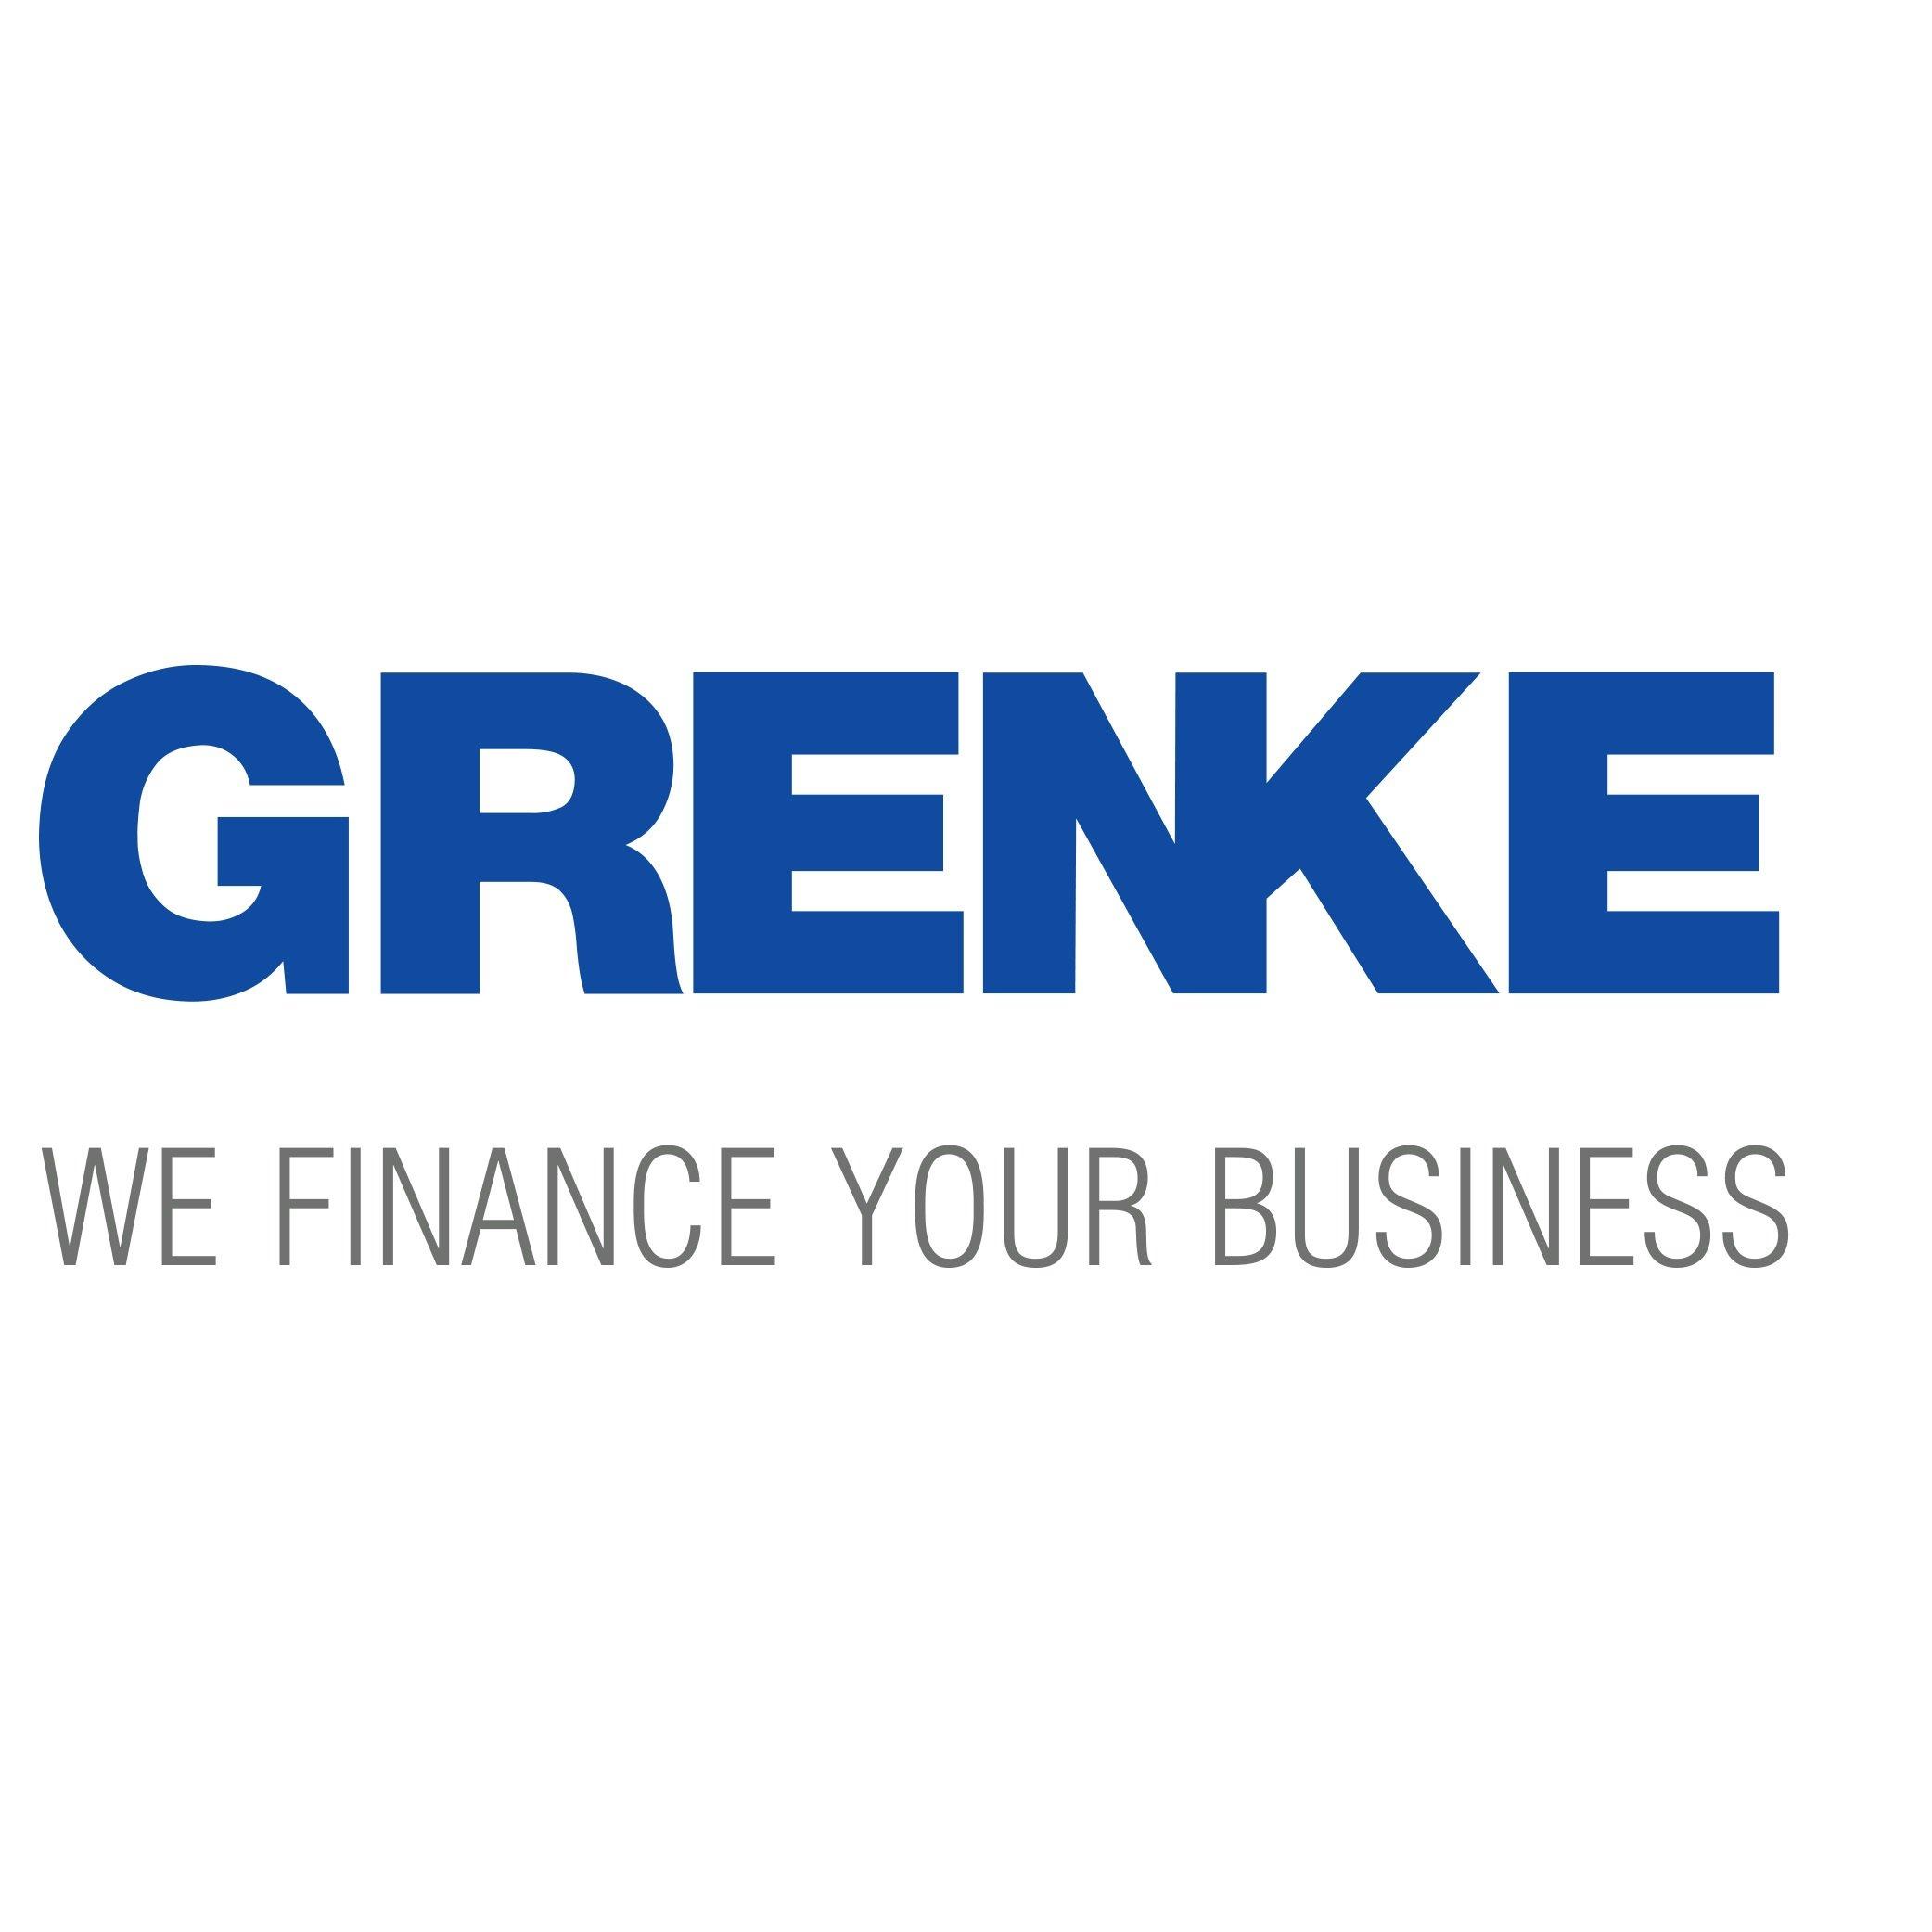 FINANZIAMNETO NOLEGGIO GRENKE LEASING